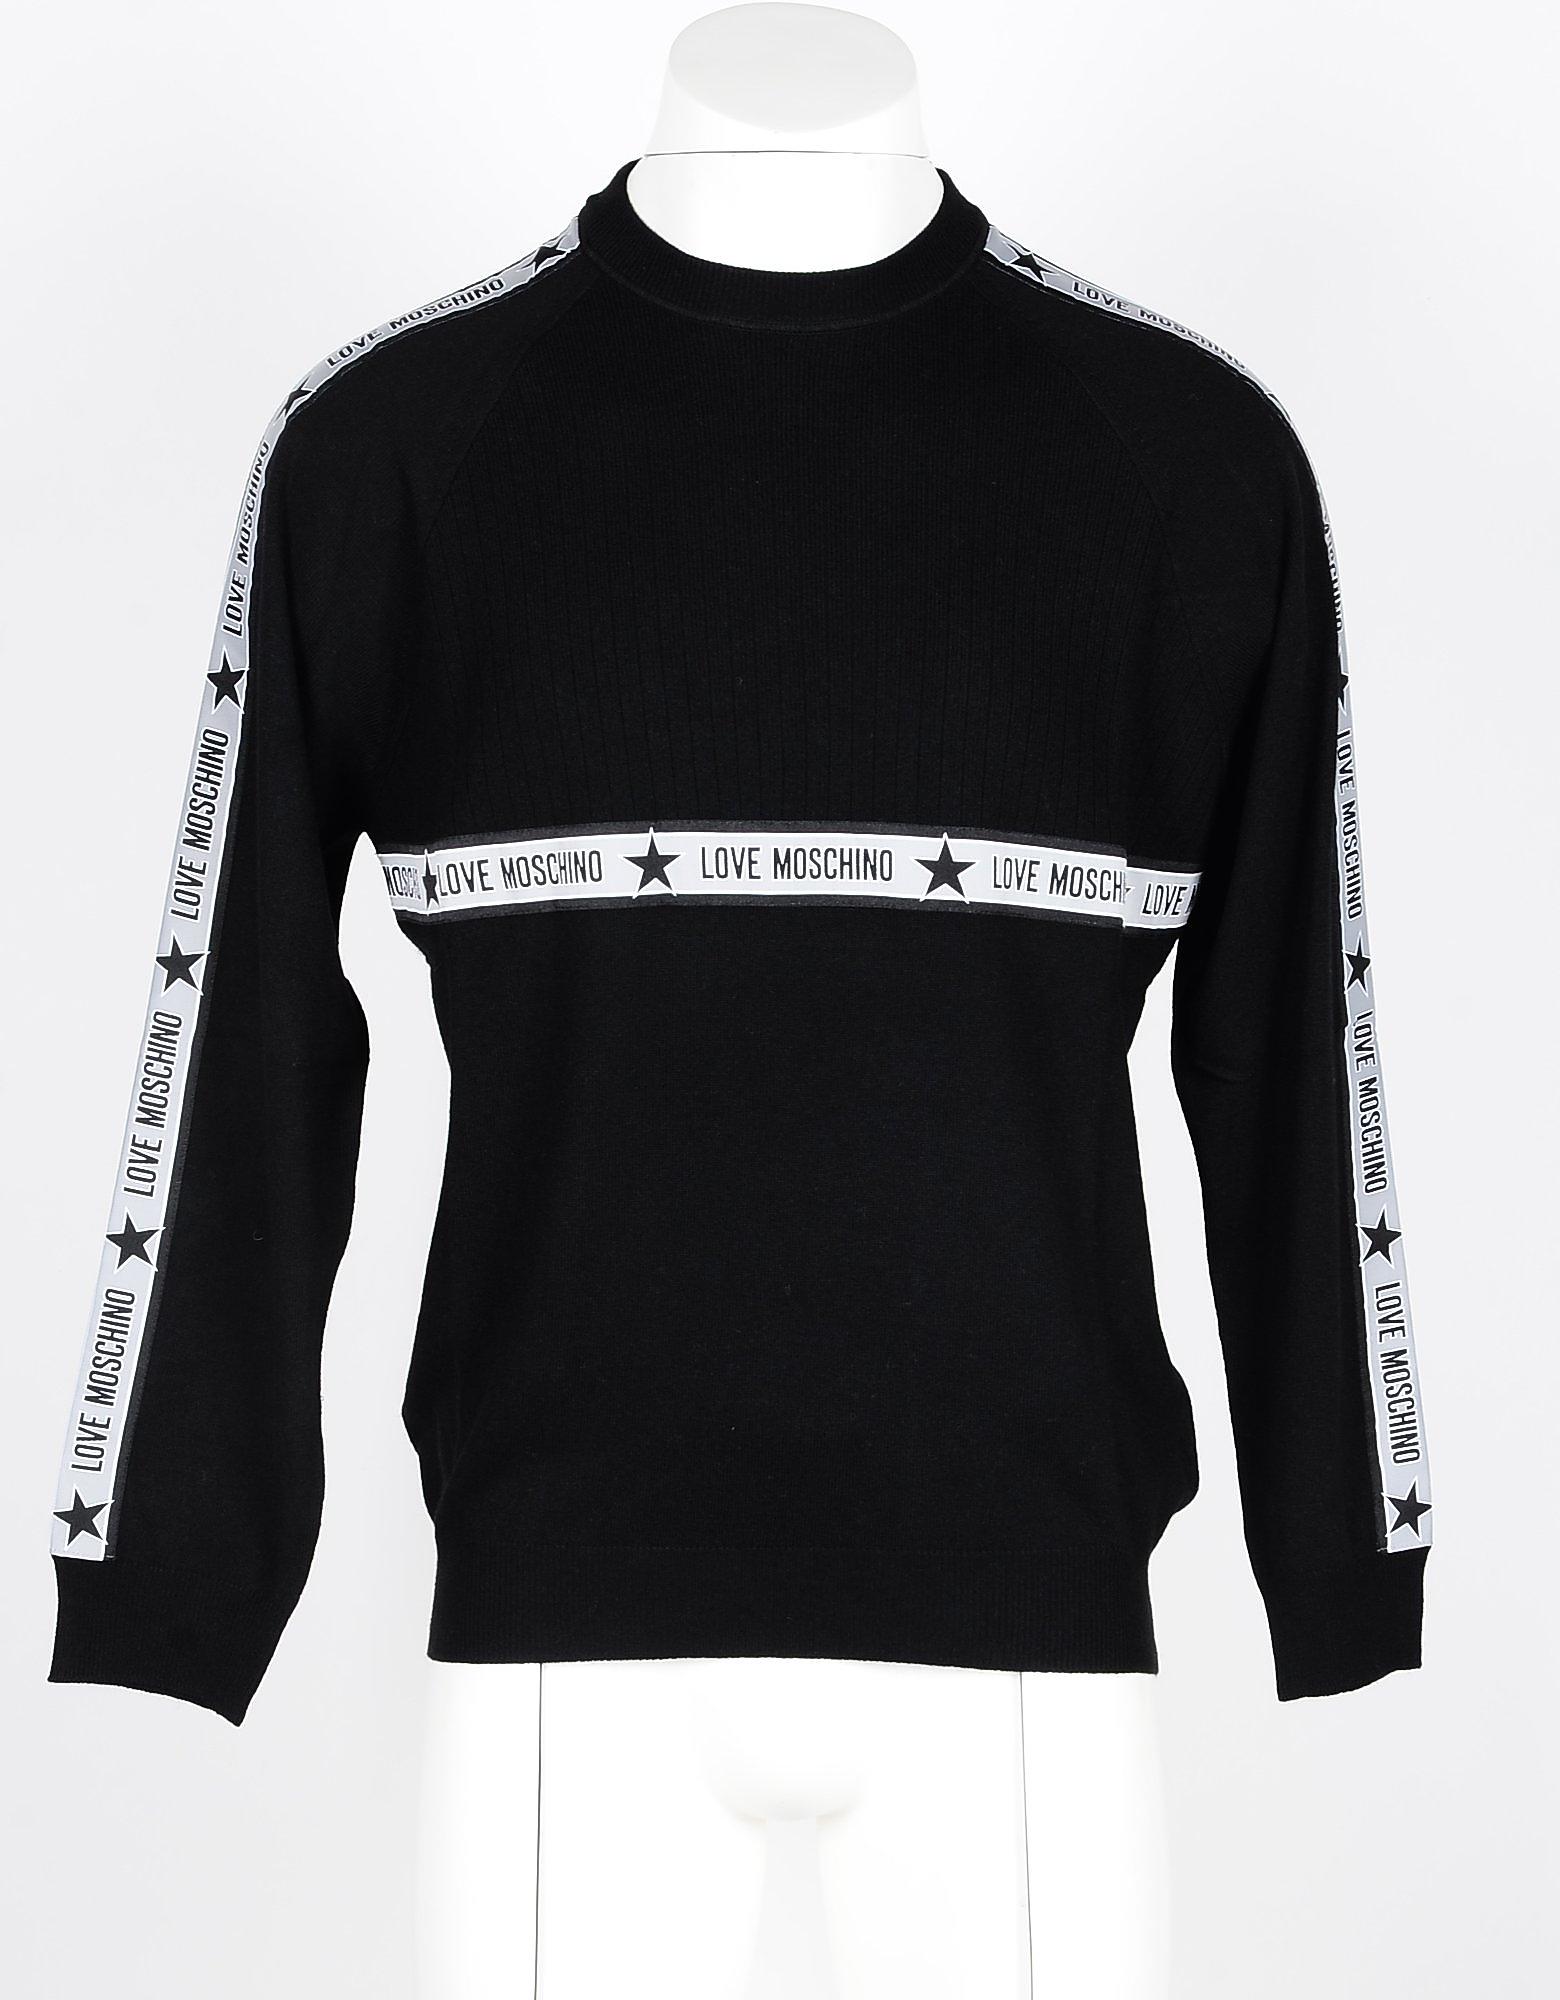 Love Moschino Designer Knitwear, Black Viscose, Wool and Cashmere Blend Men's Sweater